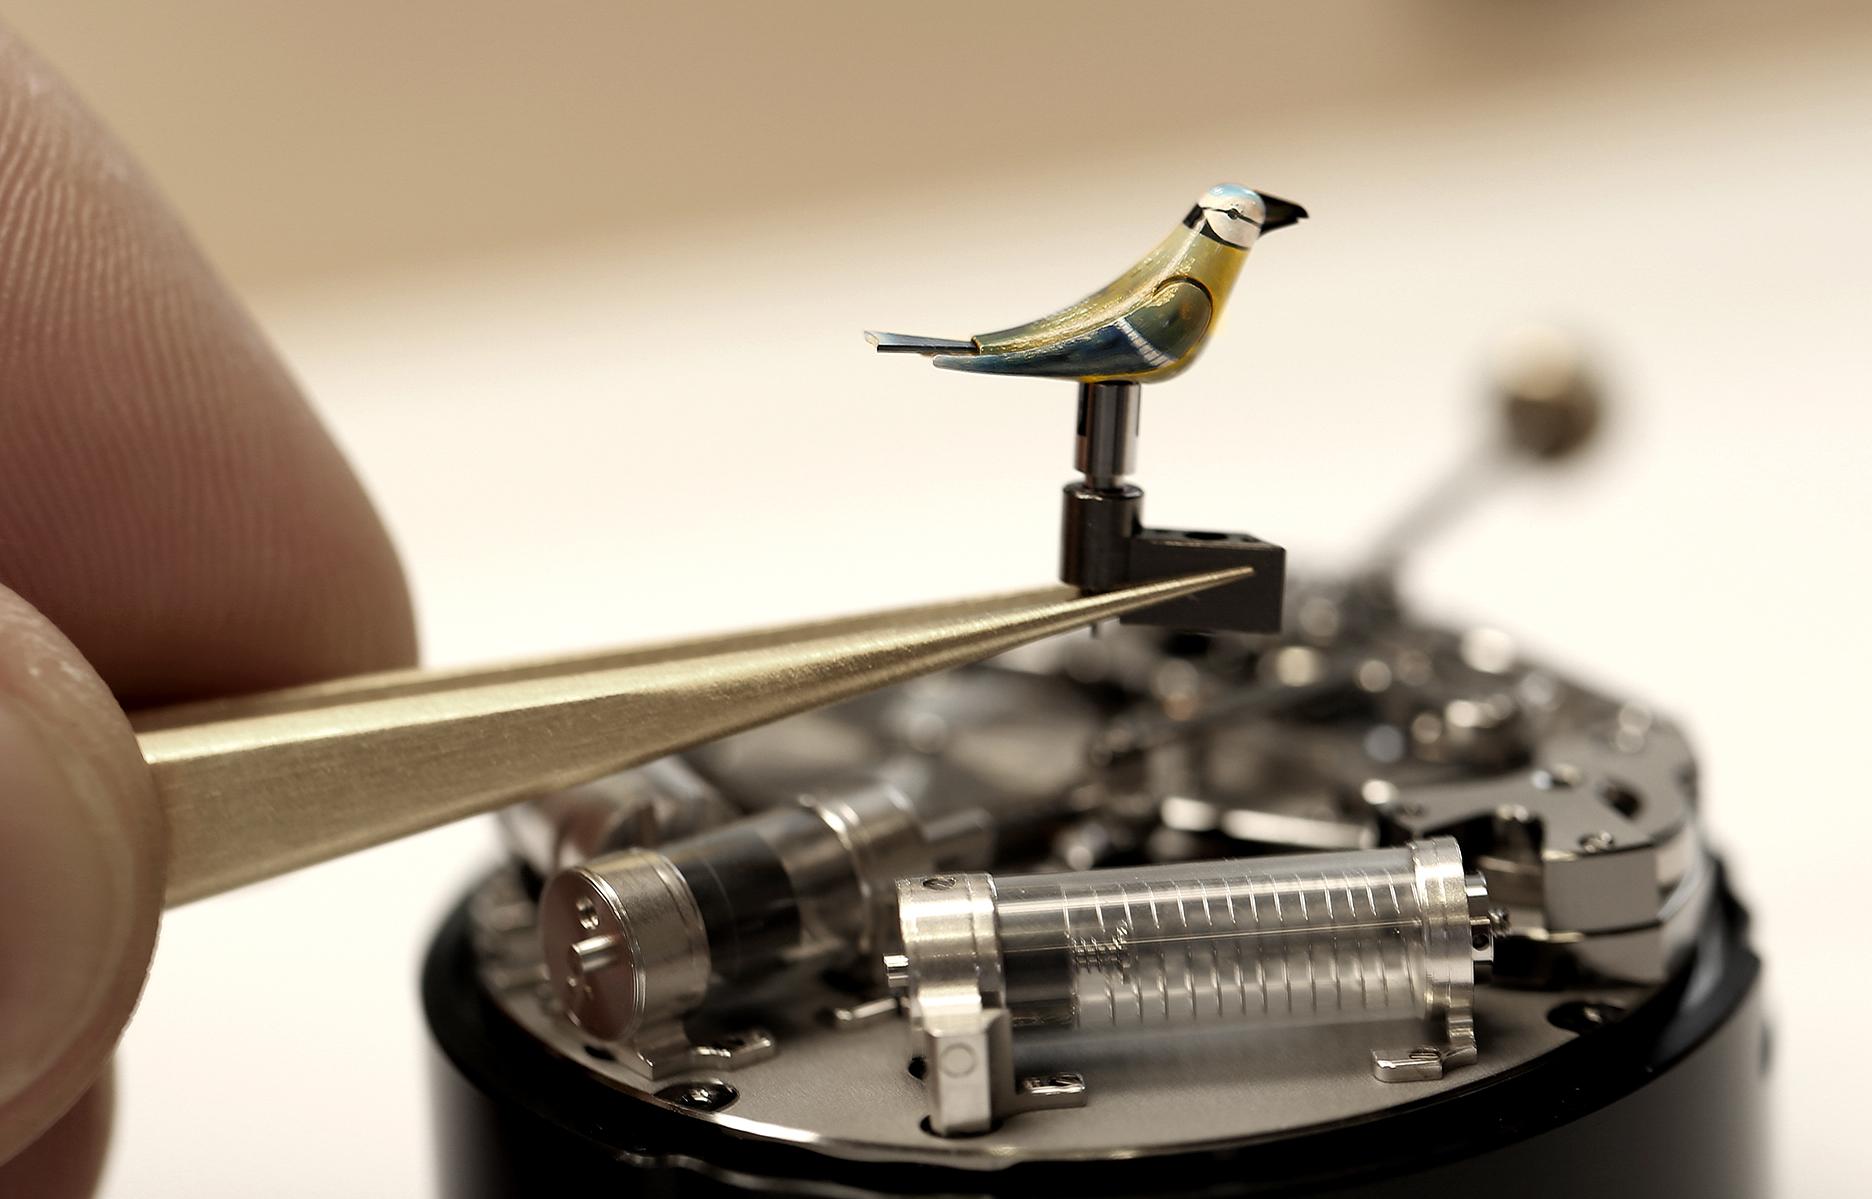 THE_CHARMING_BIRD_WORKSHOP_5